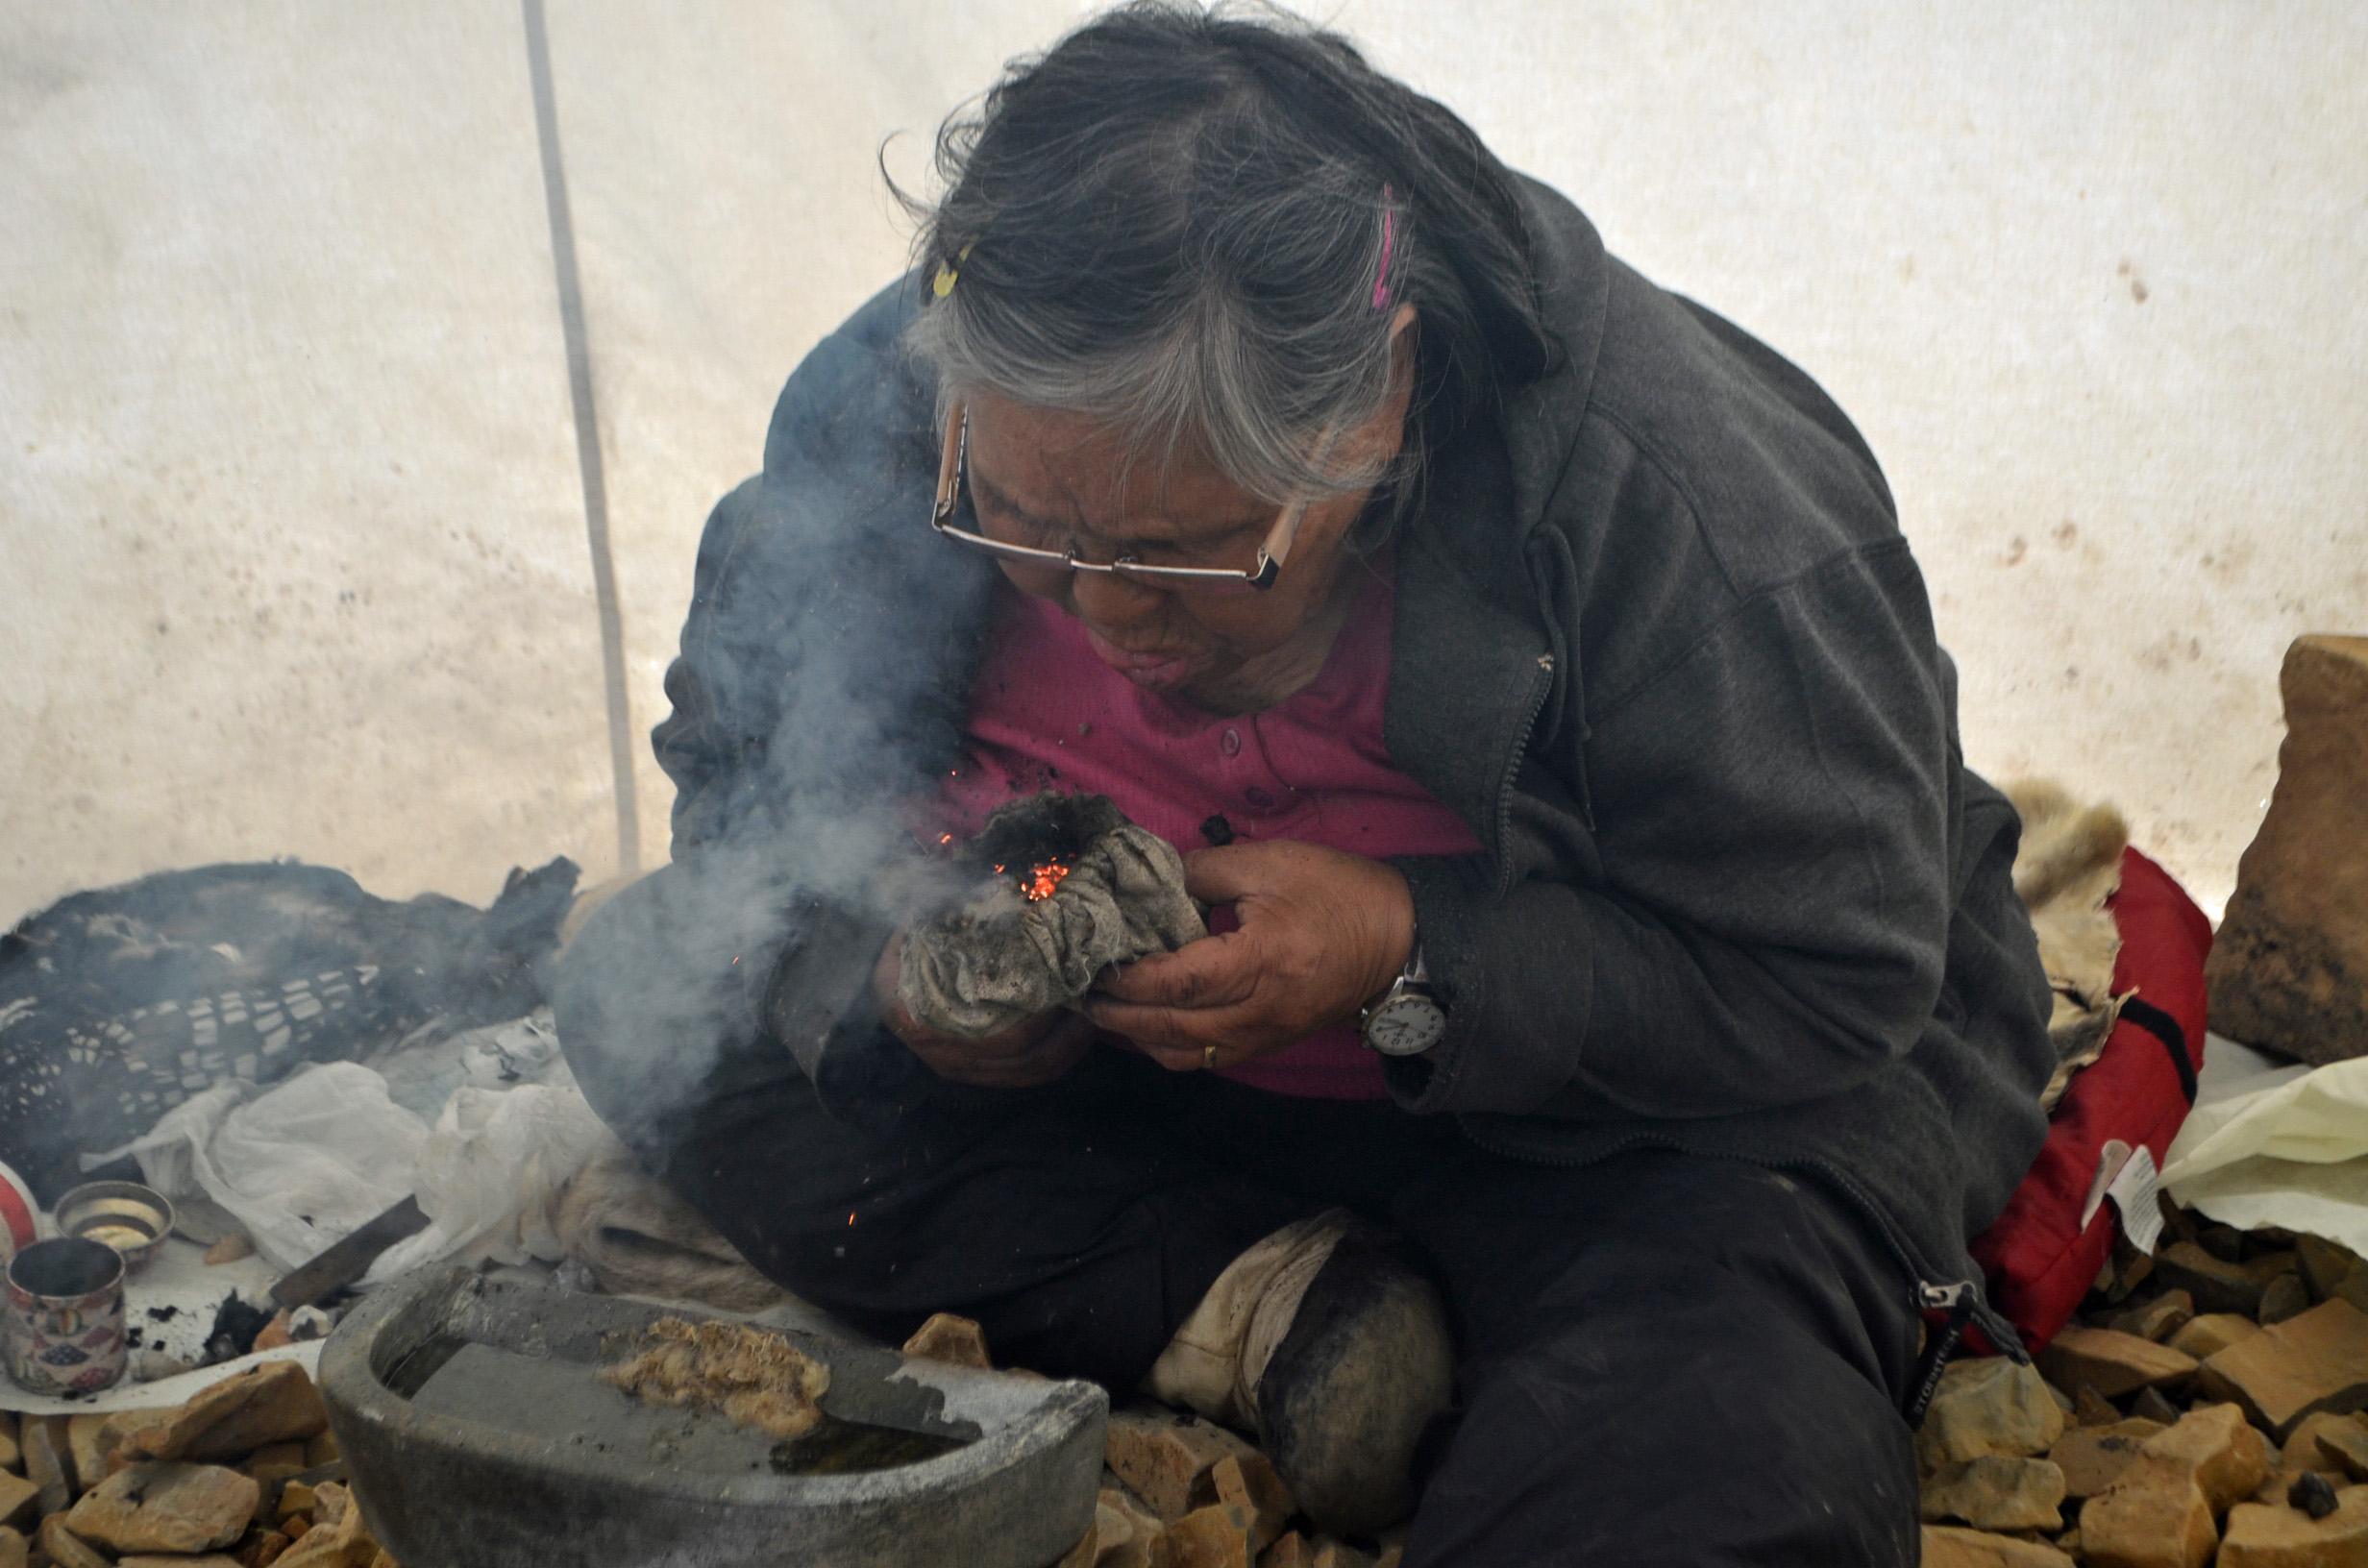 Allissa Kamingmalik demonstrates how to start a qulliq lamp from flint stones.jpg